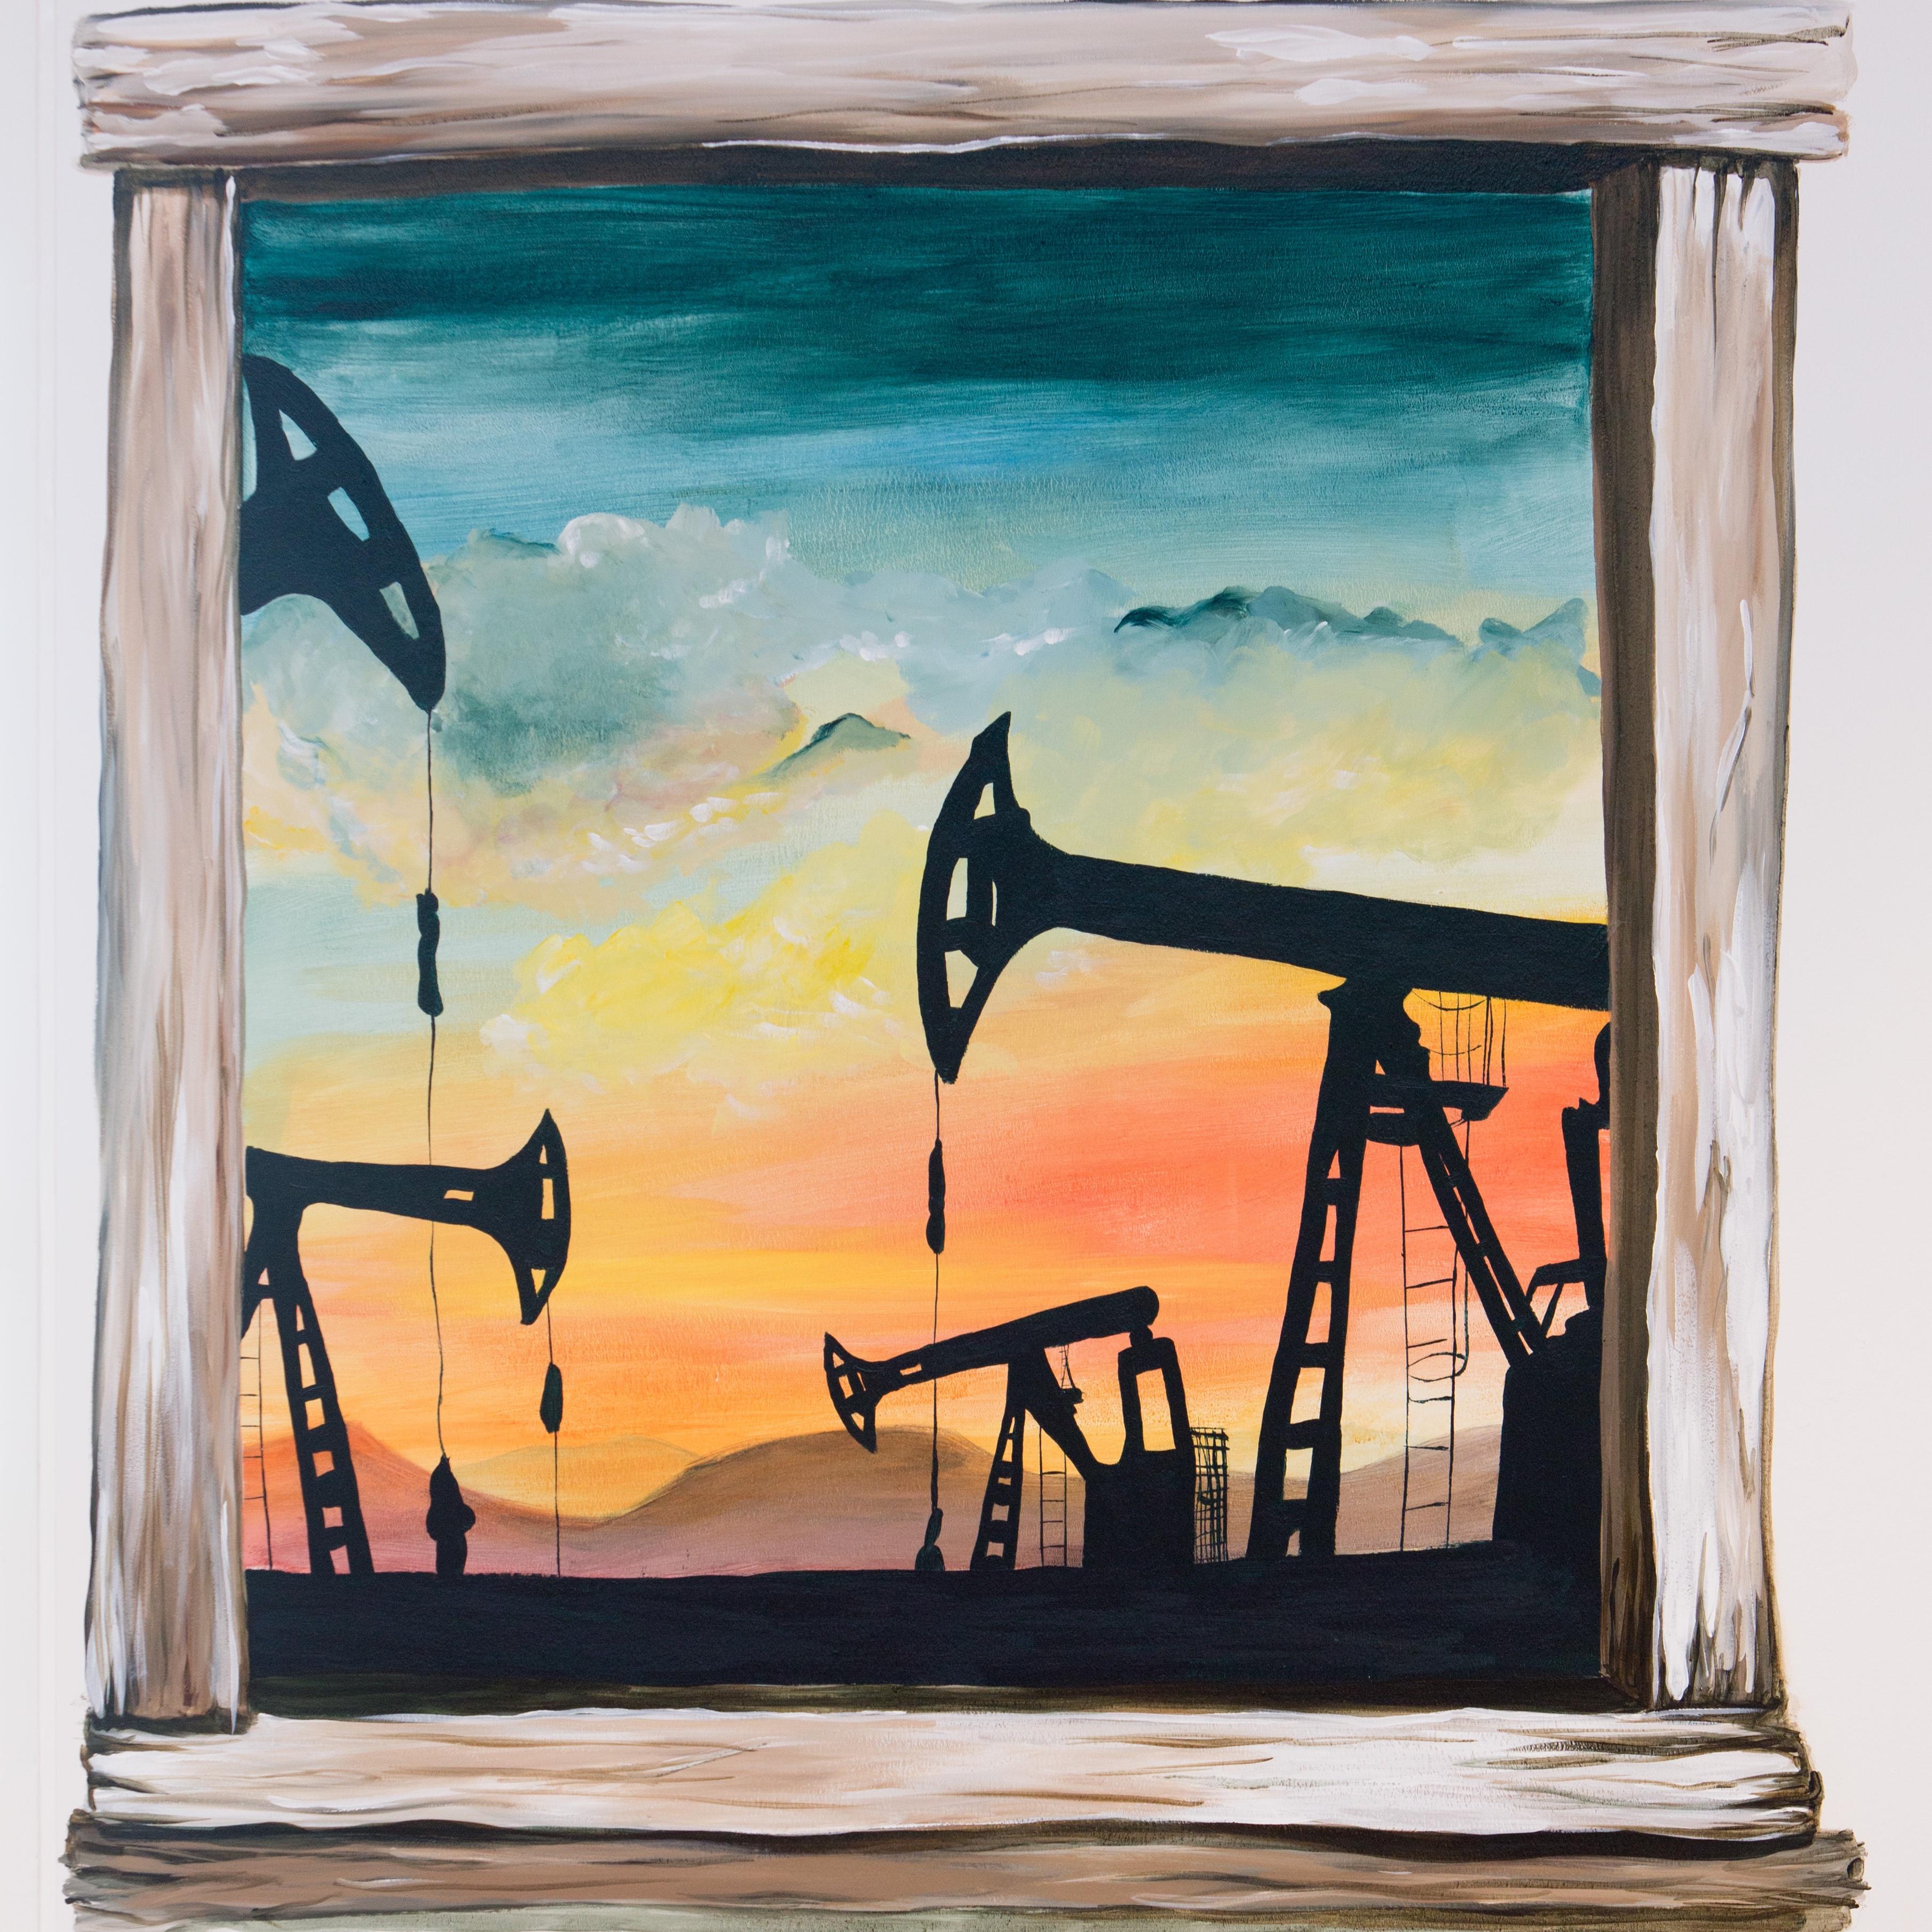 Vægmaleri, olieboringer